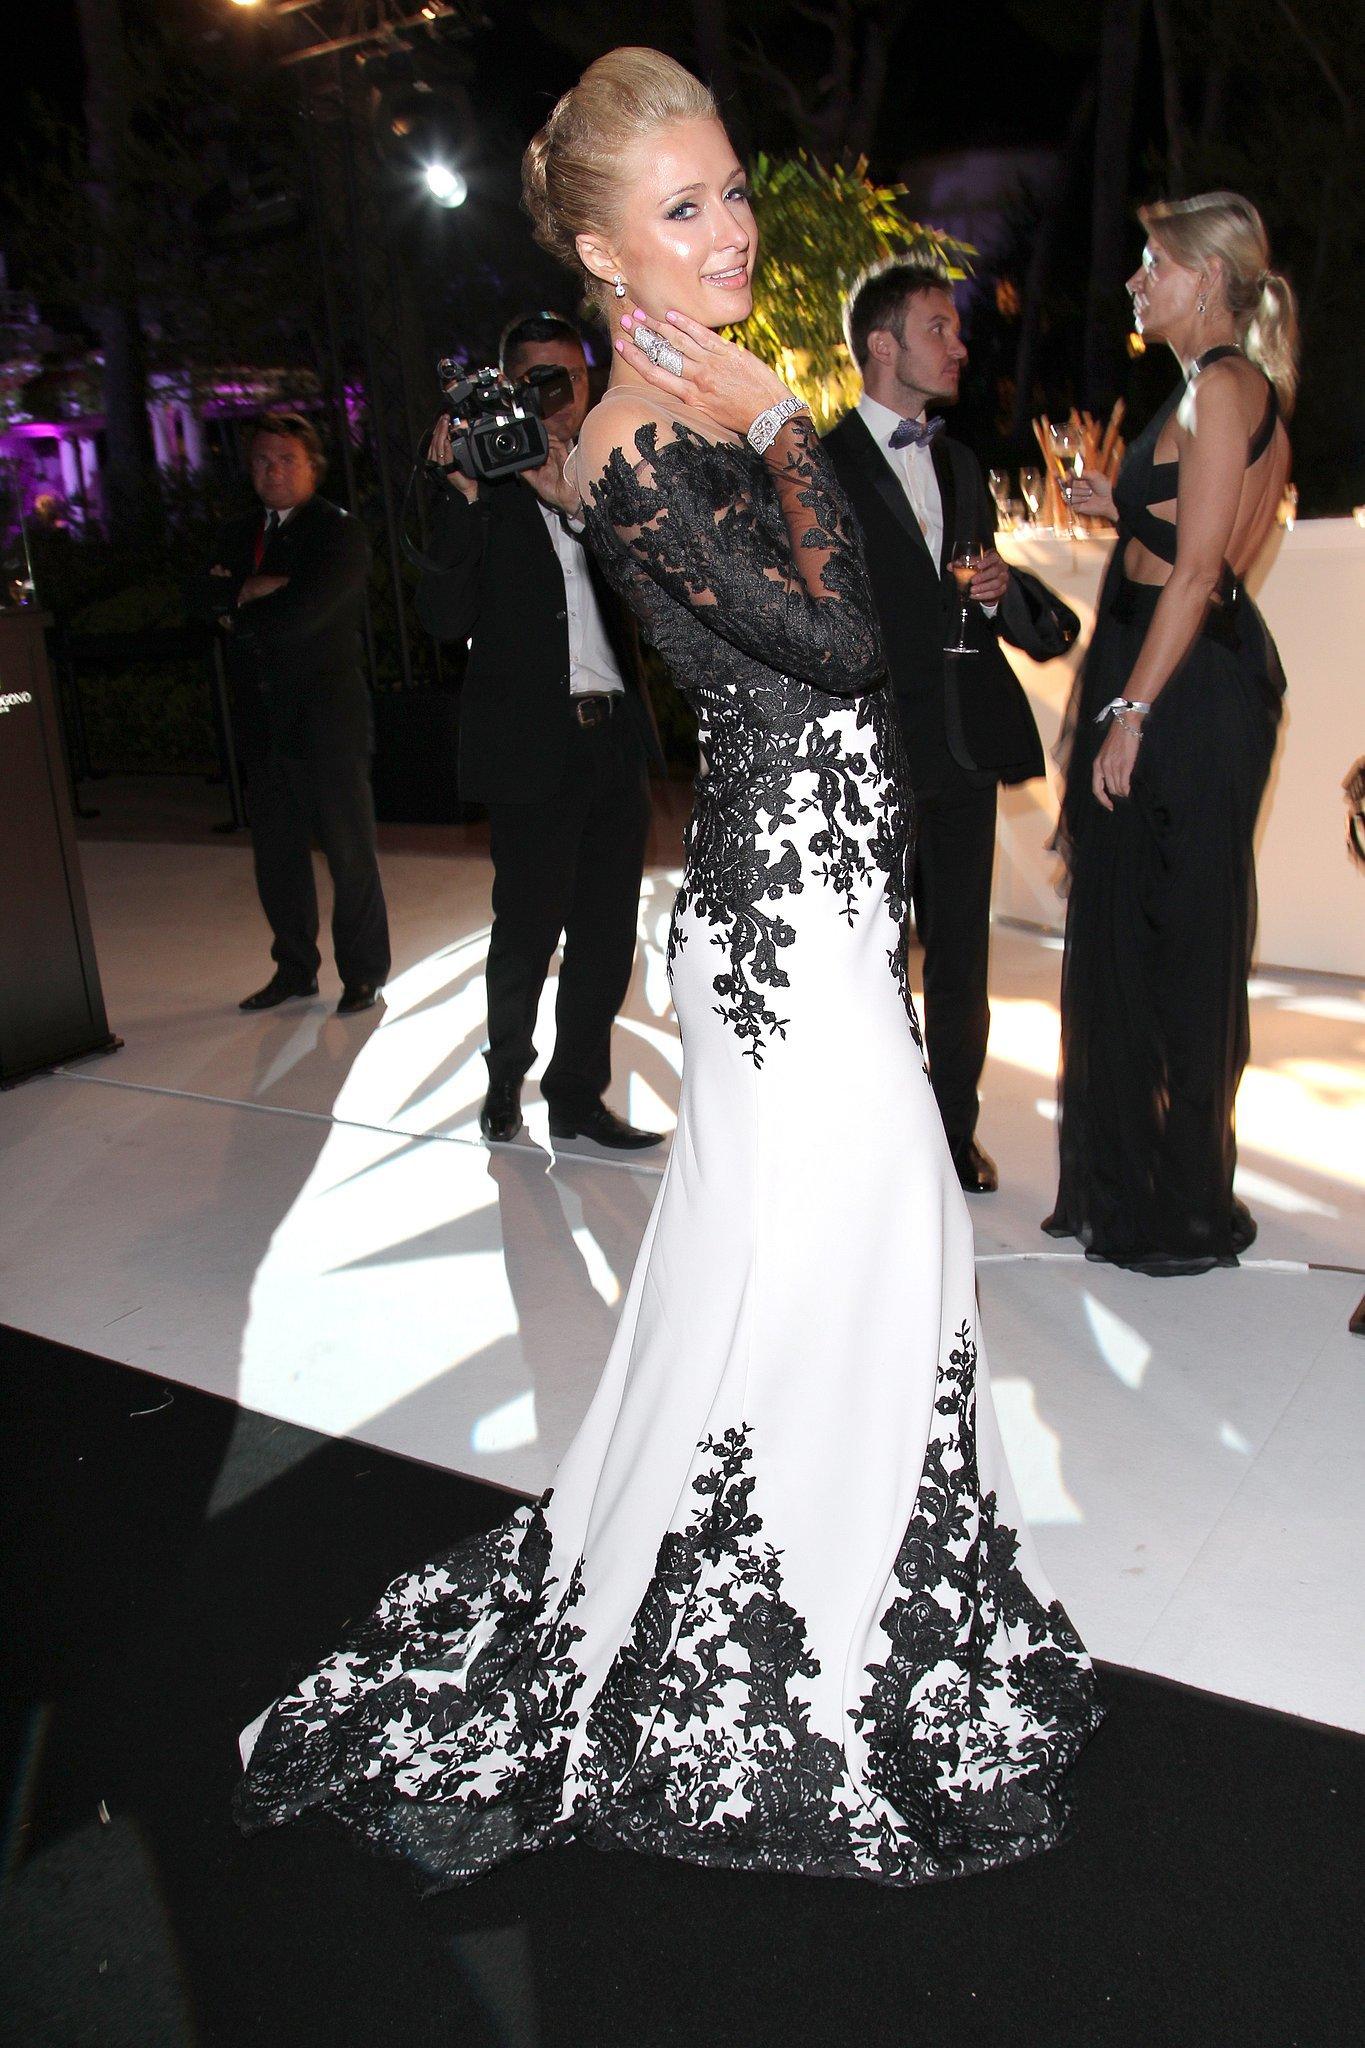 Paris Hilton wore black and white.